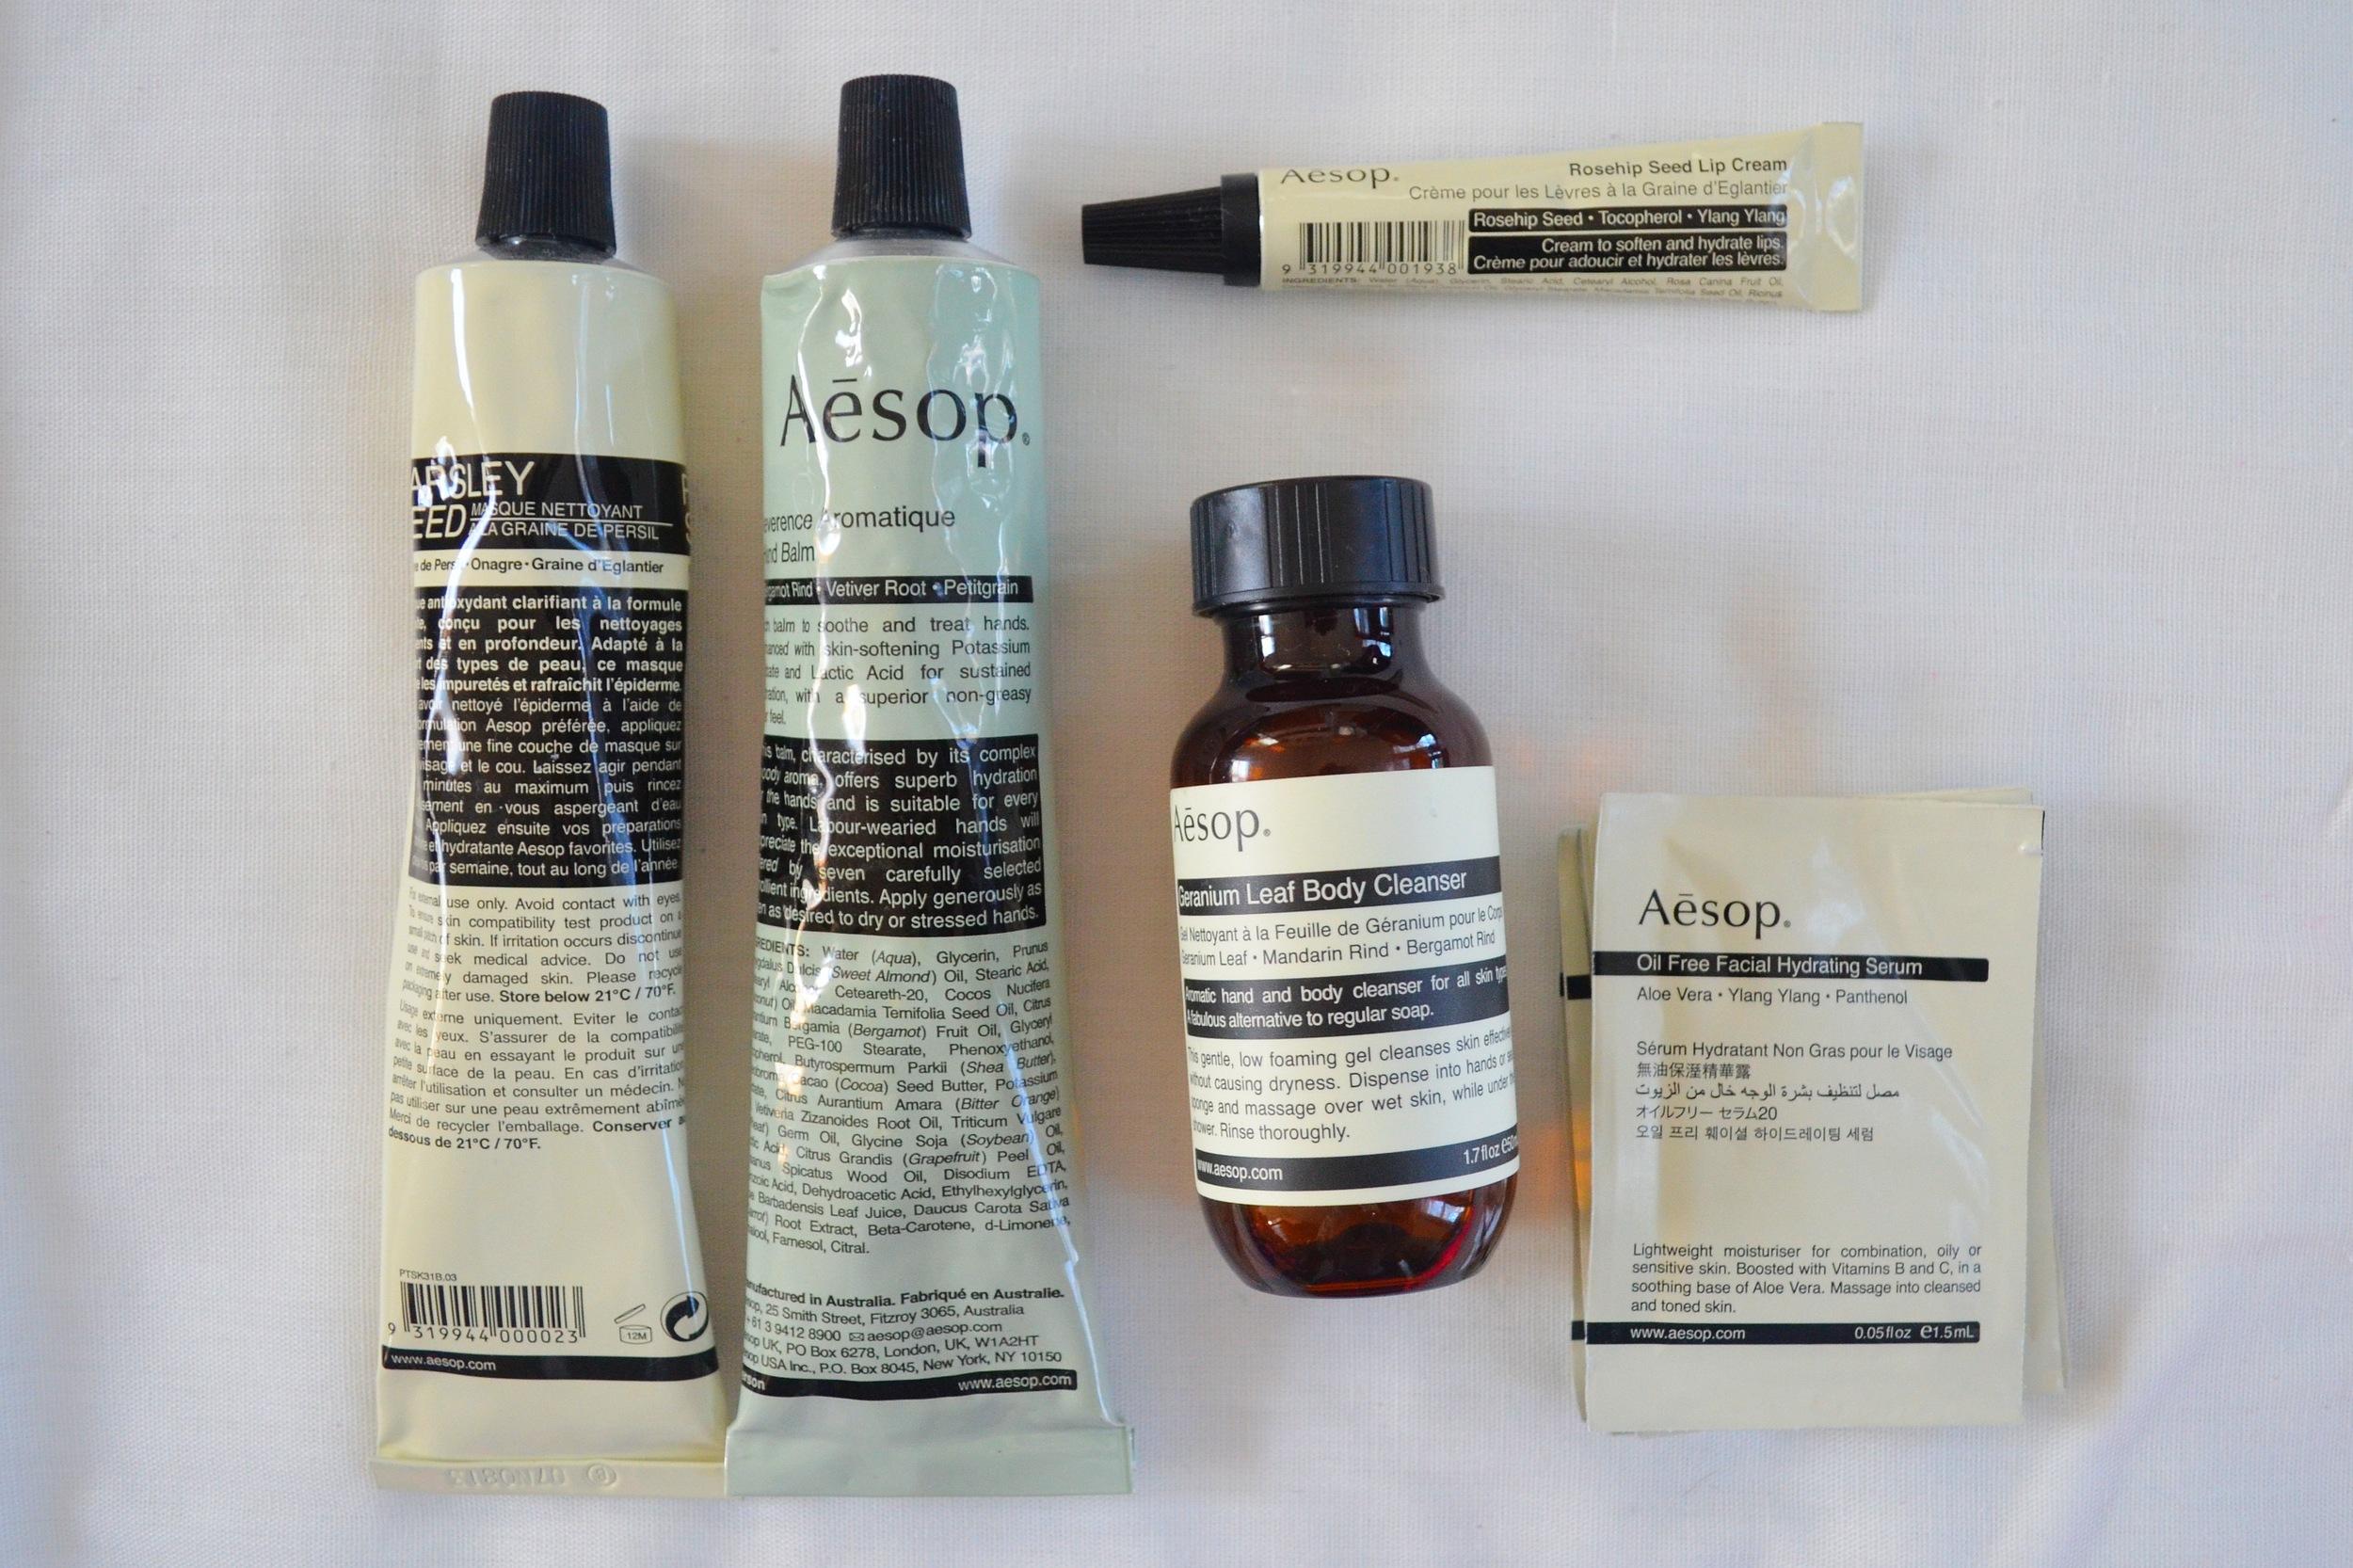 L-R: Aesop Parsley Seed Cleansing Masque, Aesop Reverence Aromatique Hand Balm, Aesop Rosehip Seed Lip Cream, Aesop Geranium Leaf Body Cleanser Sample, Aesop Skincare Samples